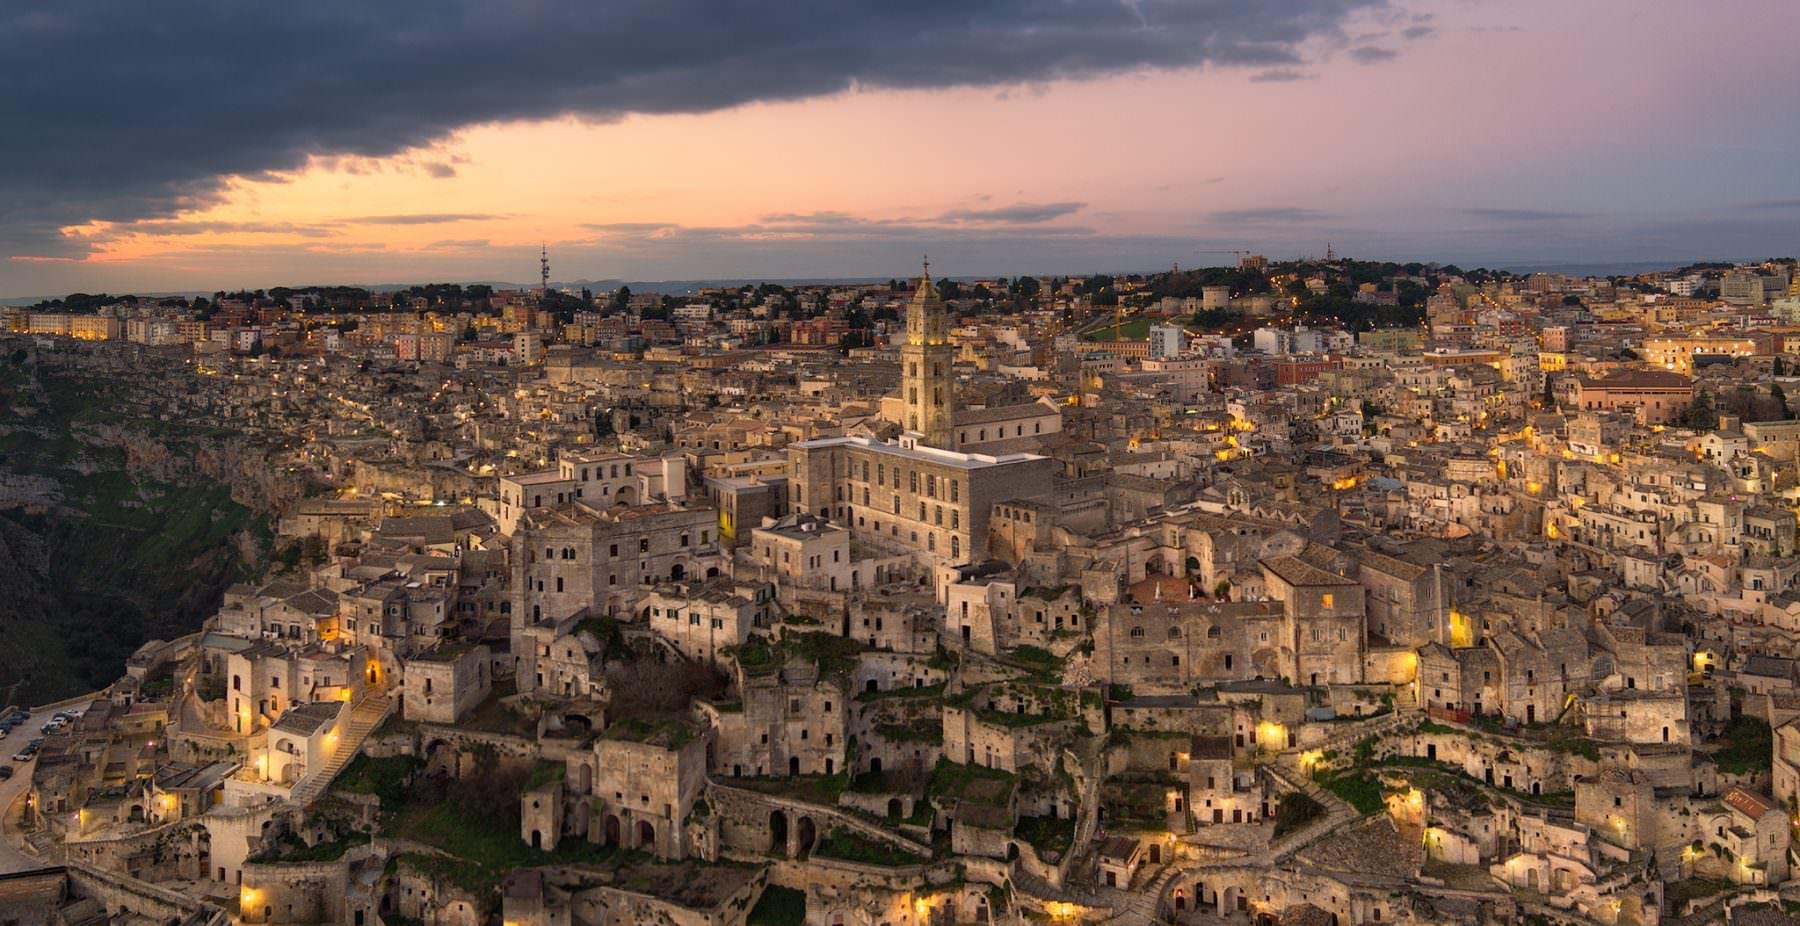 Italy, Basilicata, Sassi di Matera, Gerry Pacher, Air-Shots.ch